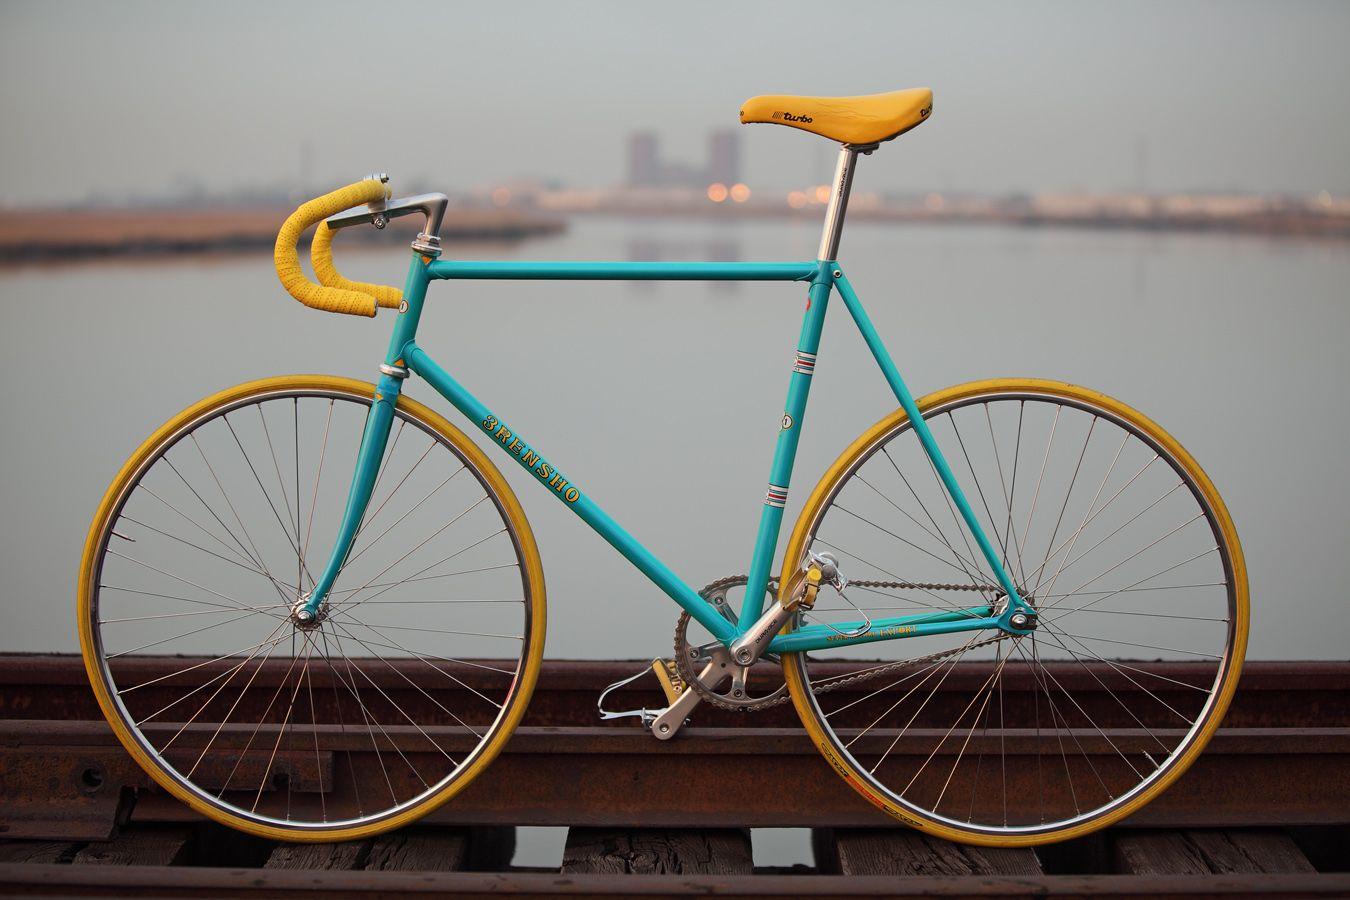 New Fixie Fixed Road Bike Bicycle cycling Saddle Seat Yellow stylish